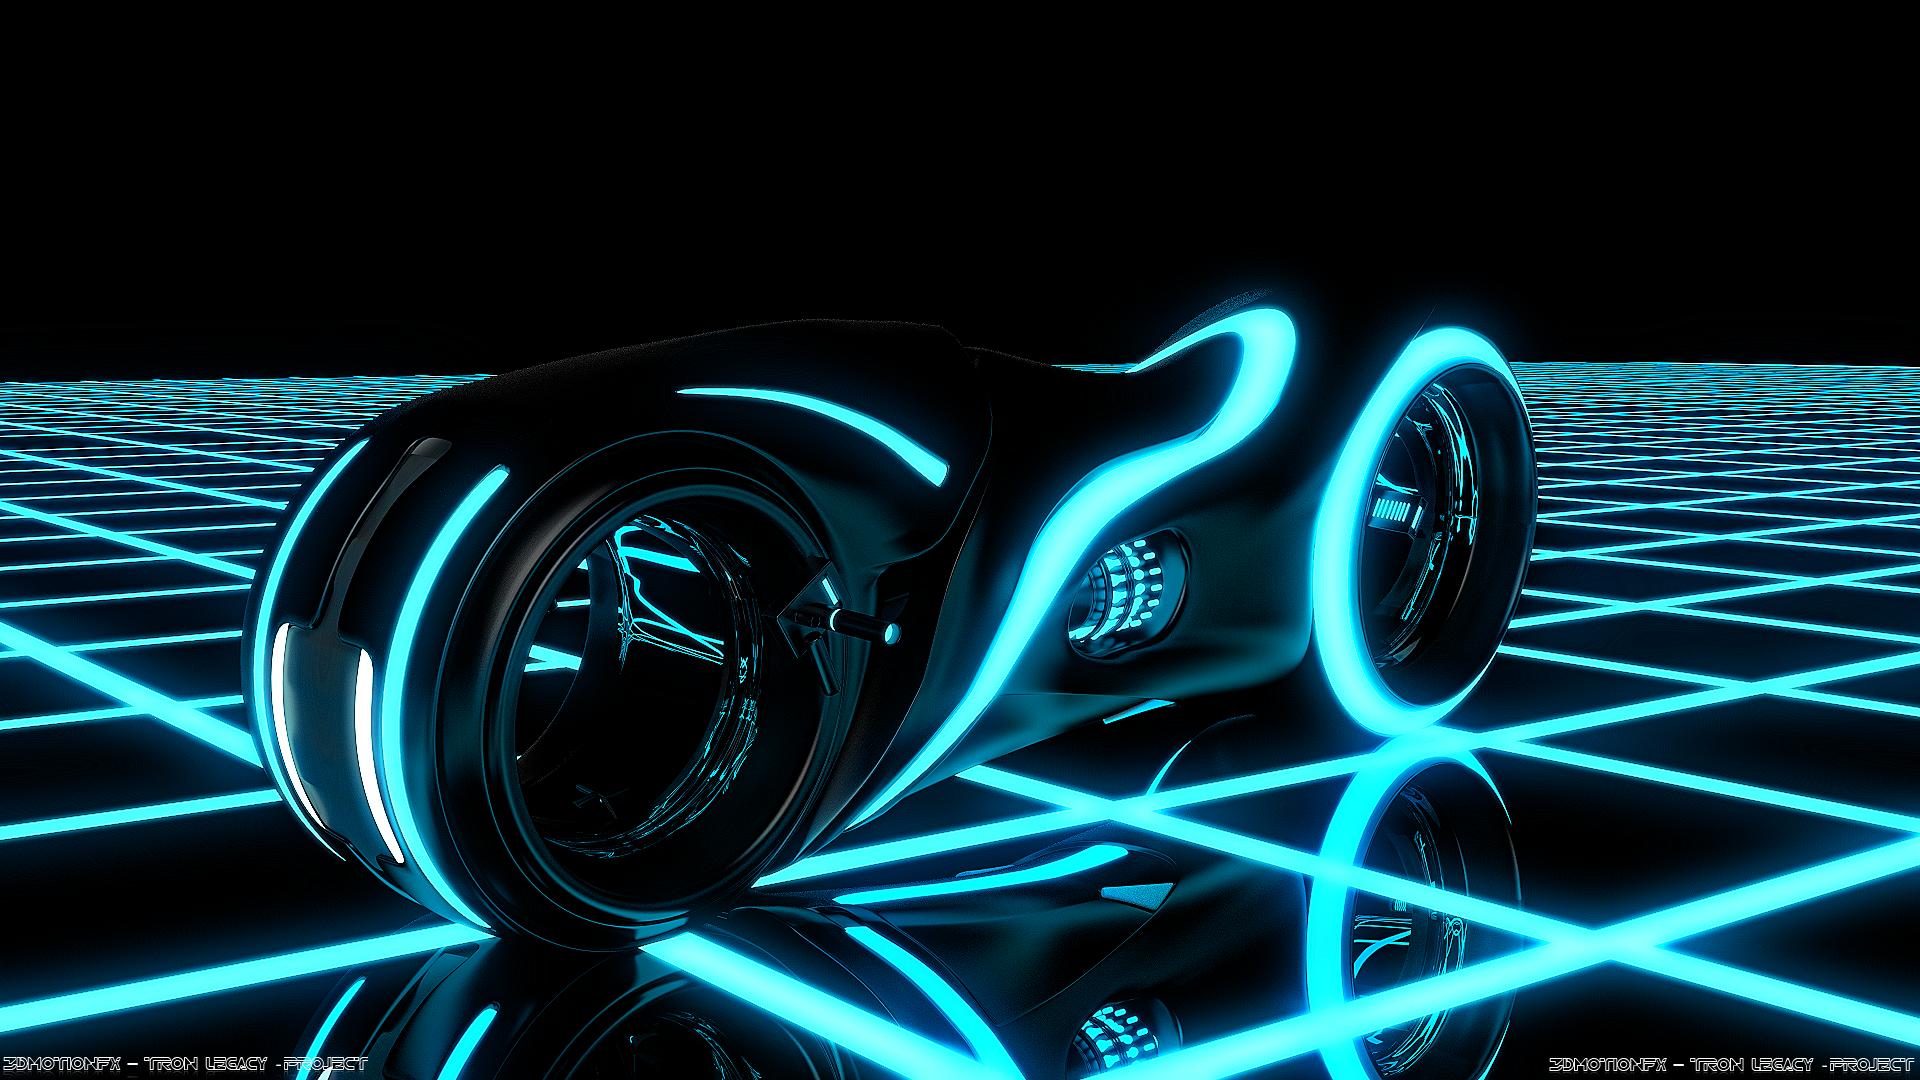 Tron Legacy Blender Render Alex 3dm by Bigbang06